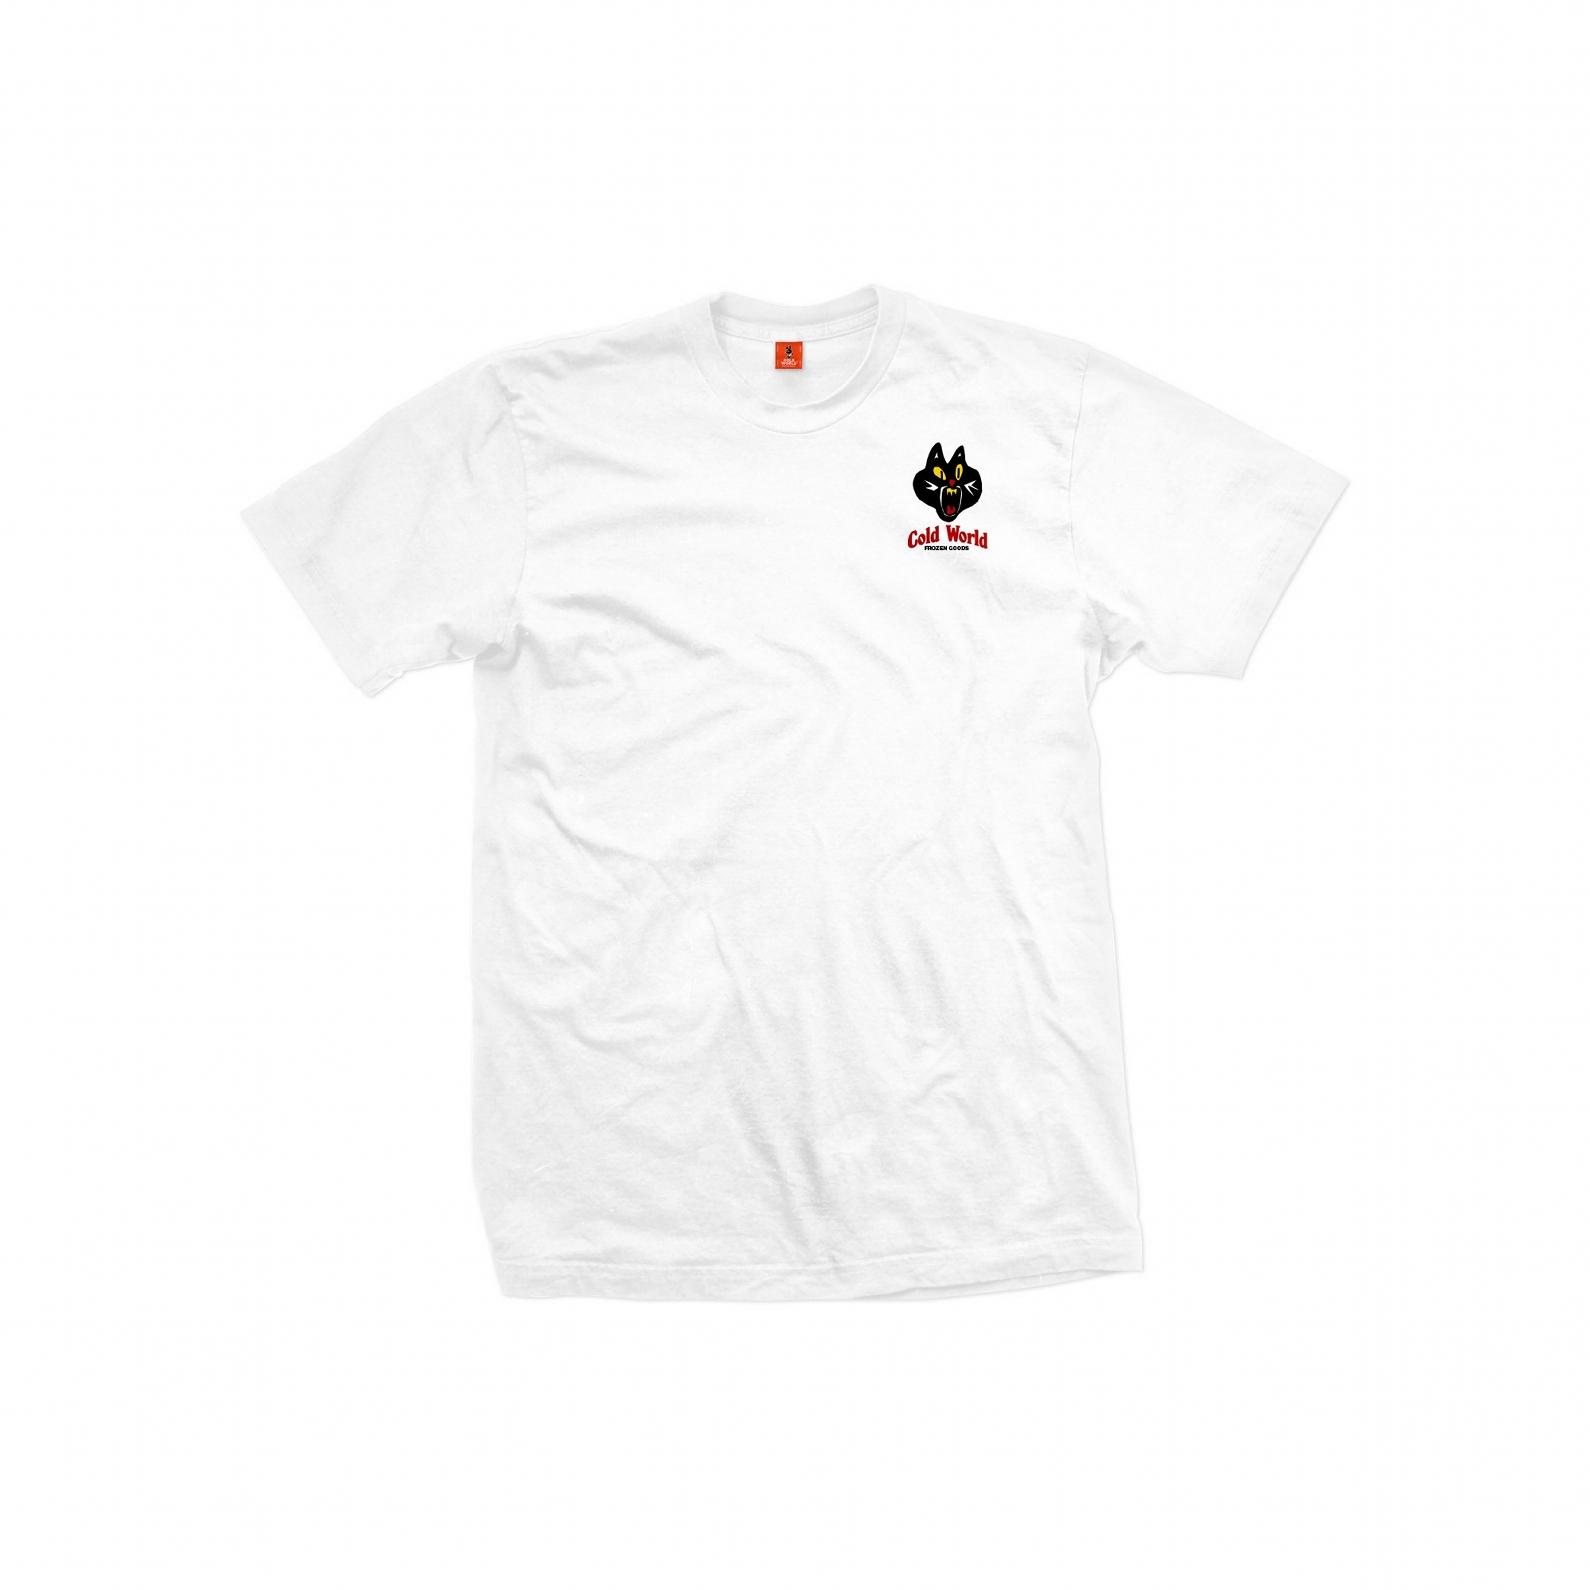 【COLD WORLD FROZEN GOODS/コールドワールドフローズングッズ】JAZZ CAT T-SHIRT Tシャツ / WHITE